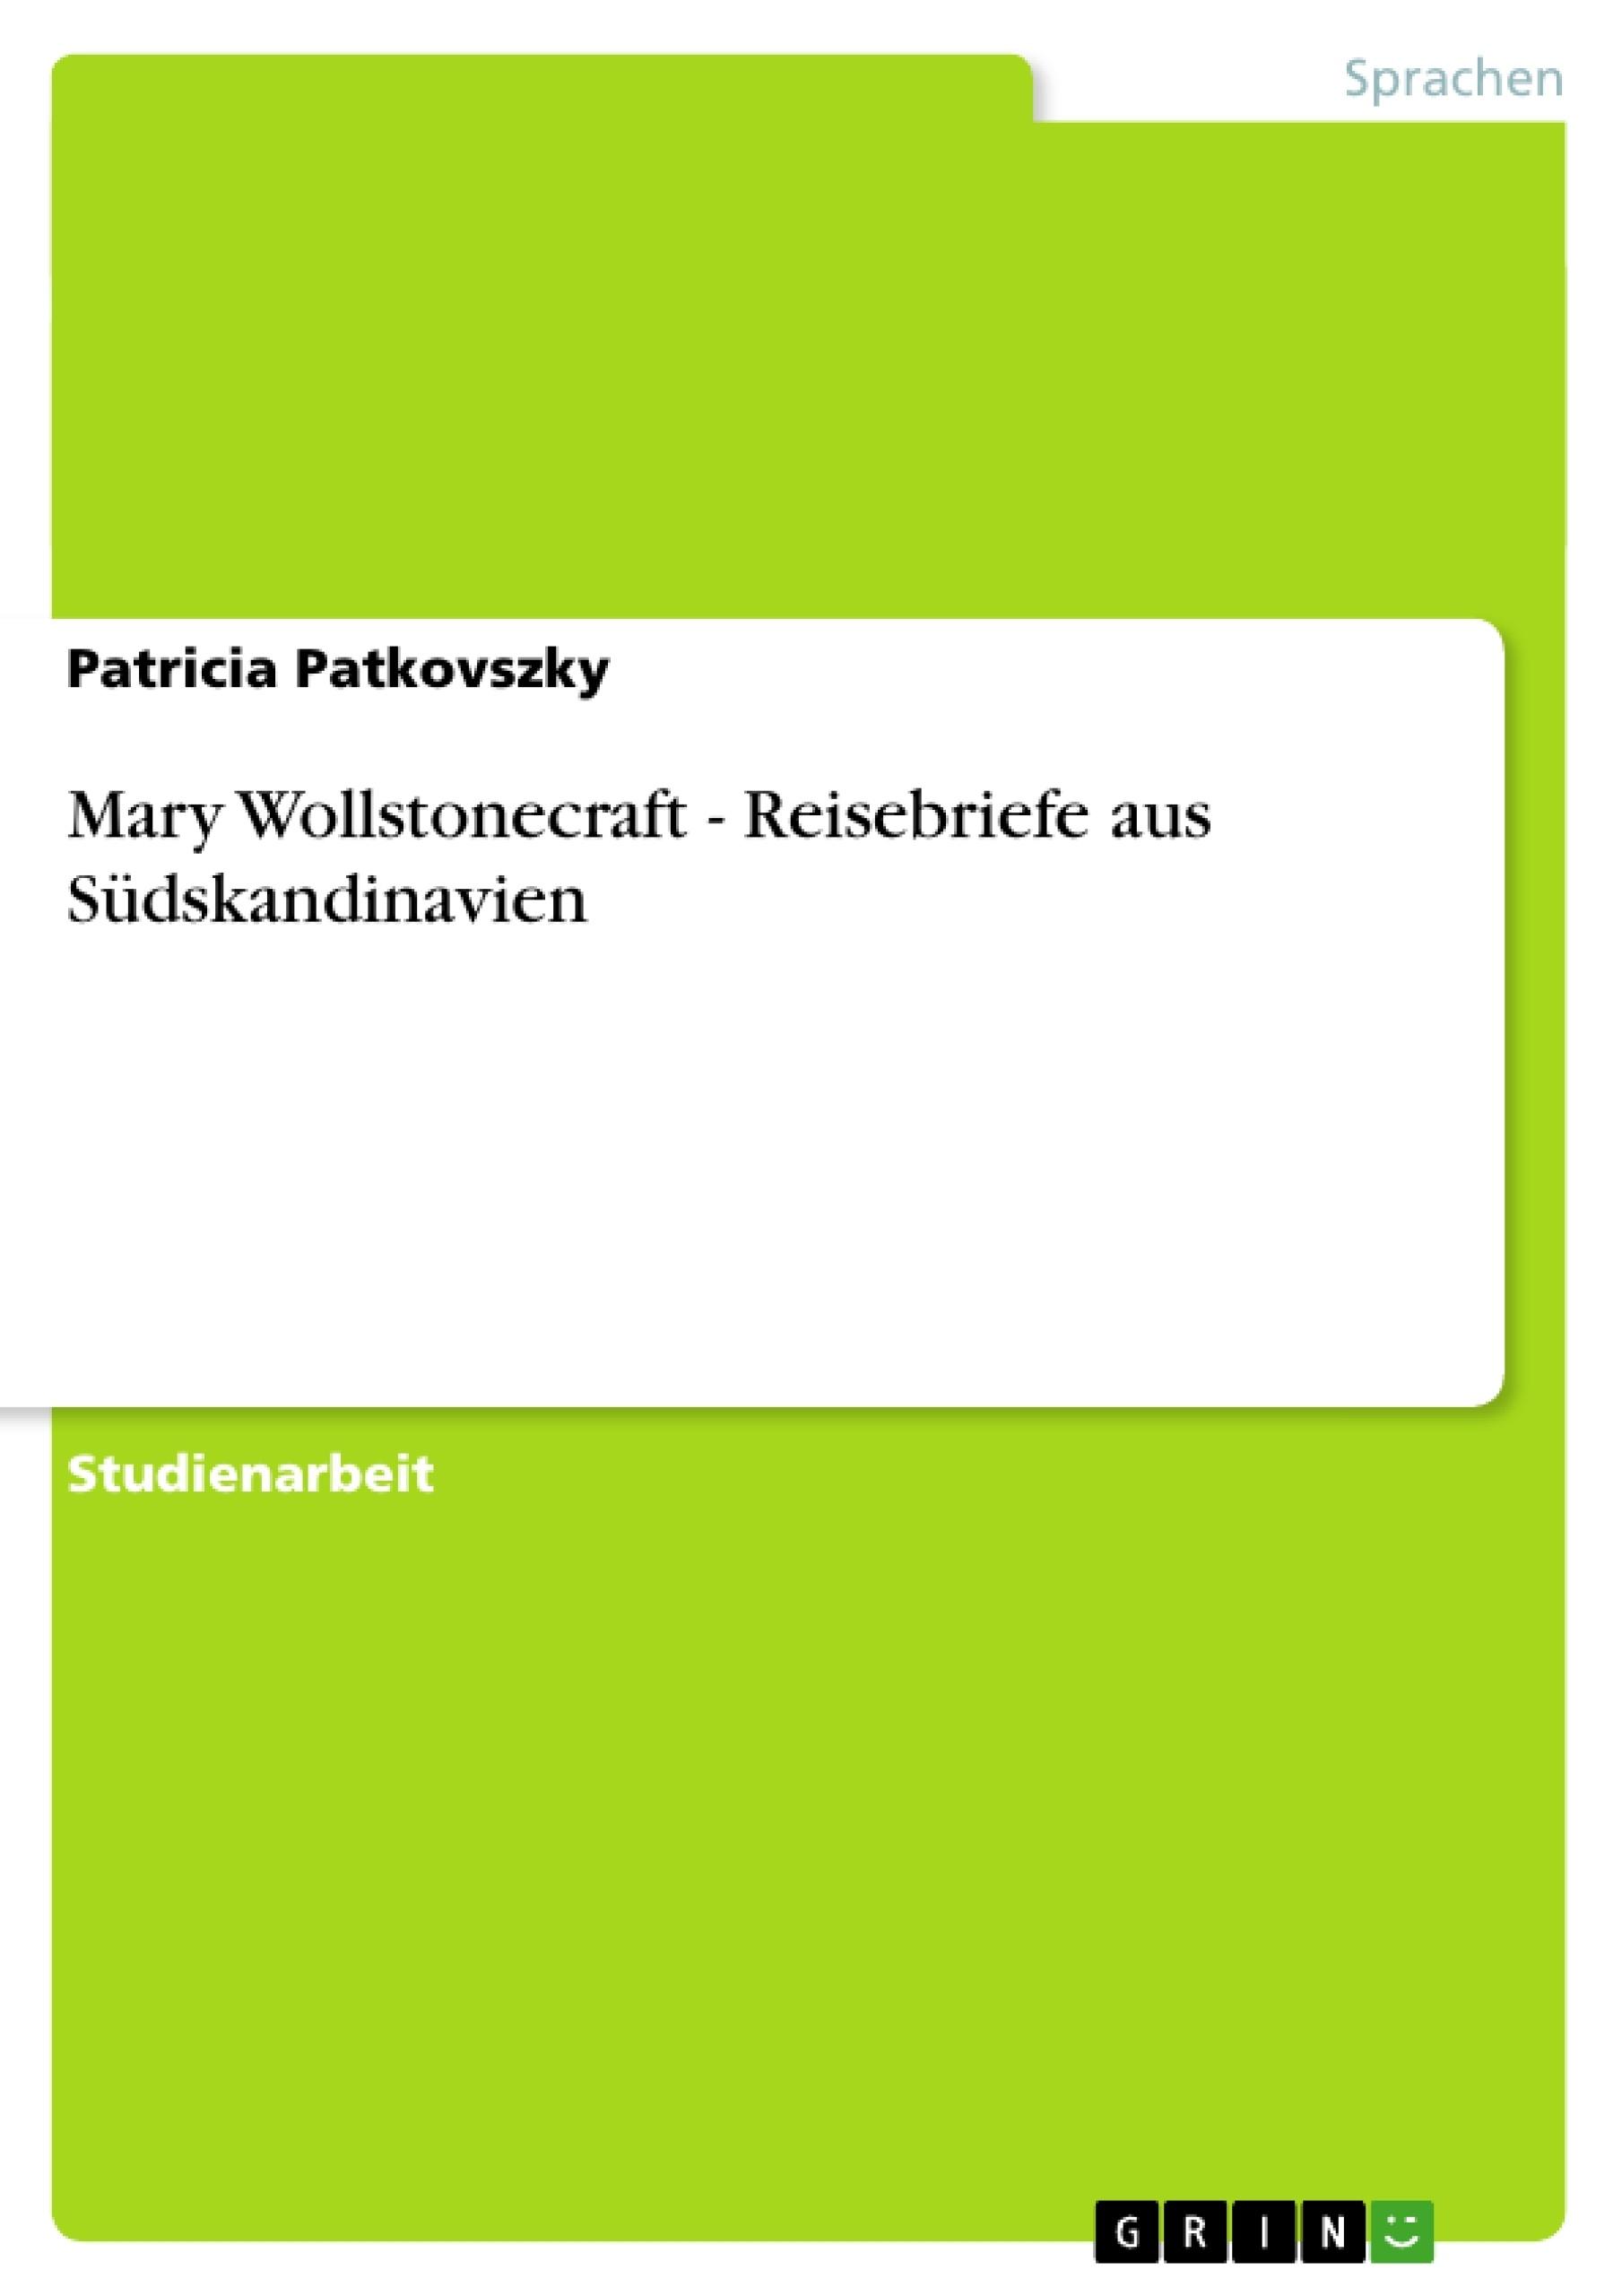 Titel: Mary Wollstonecraft - Reisebriefe aus Südskandinavien